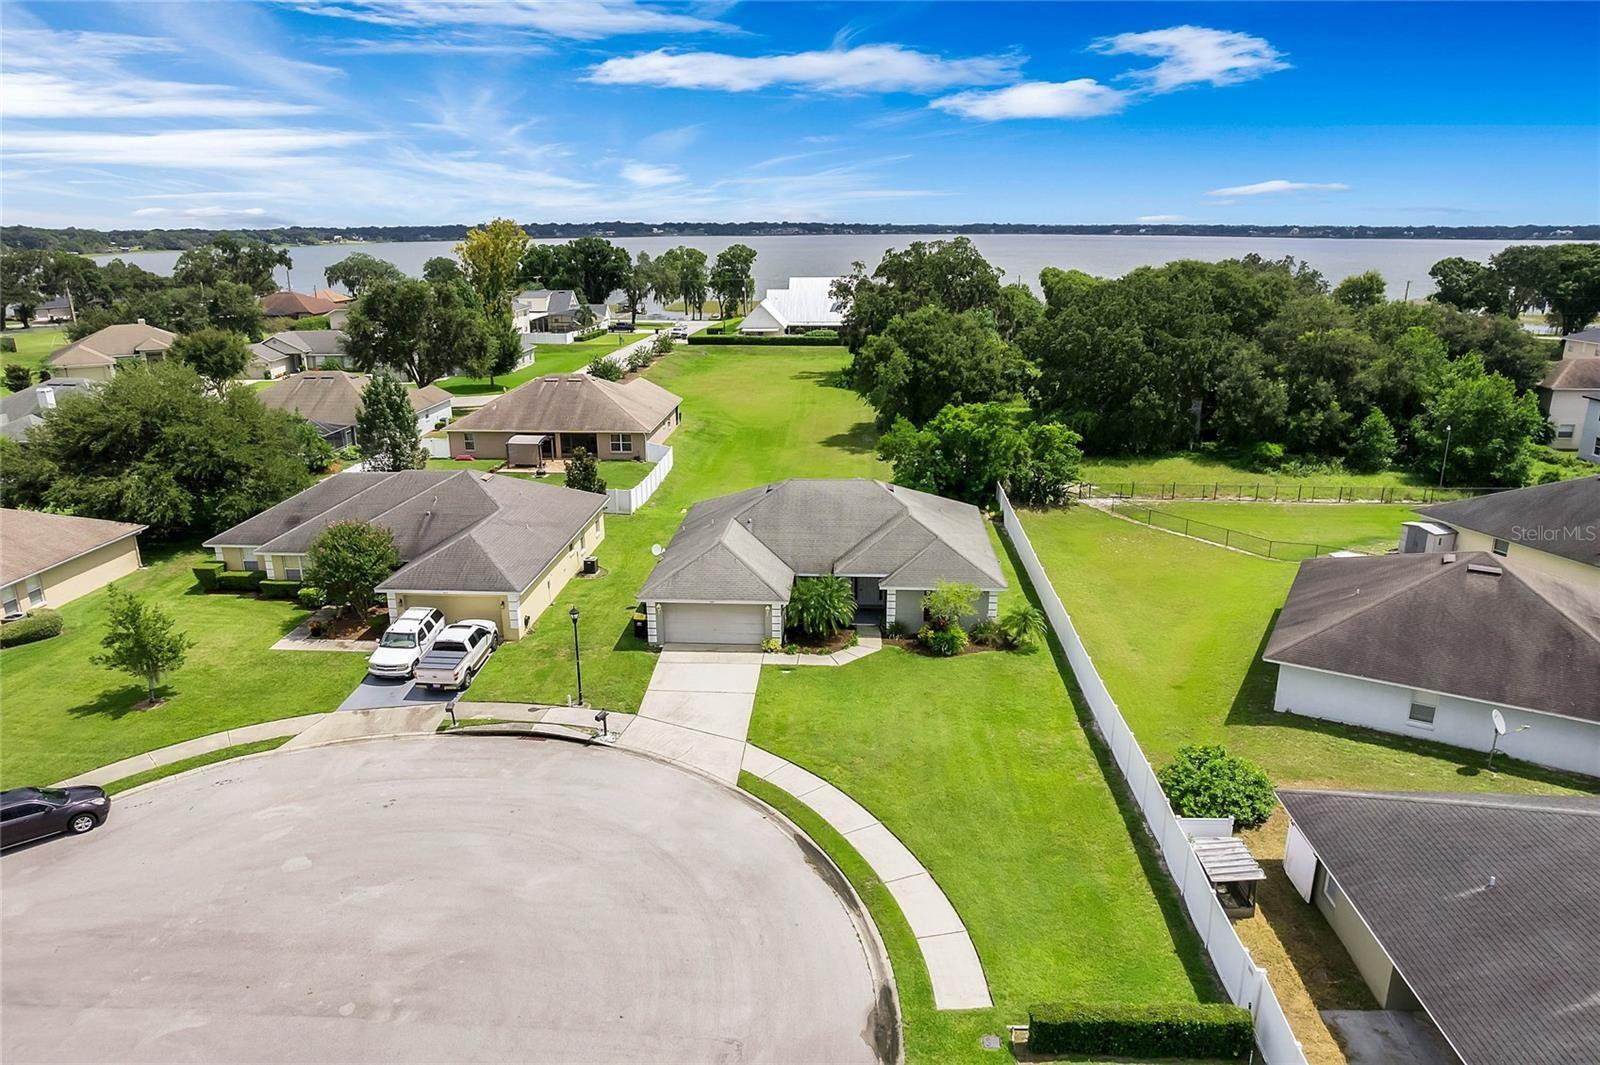 528 AMBER COURT, Auburndale, FL 33823 - MLS#: P4917981